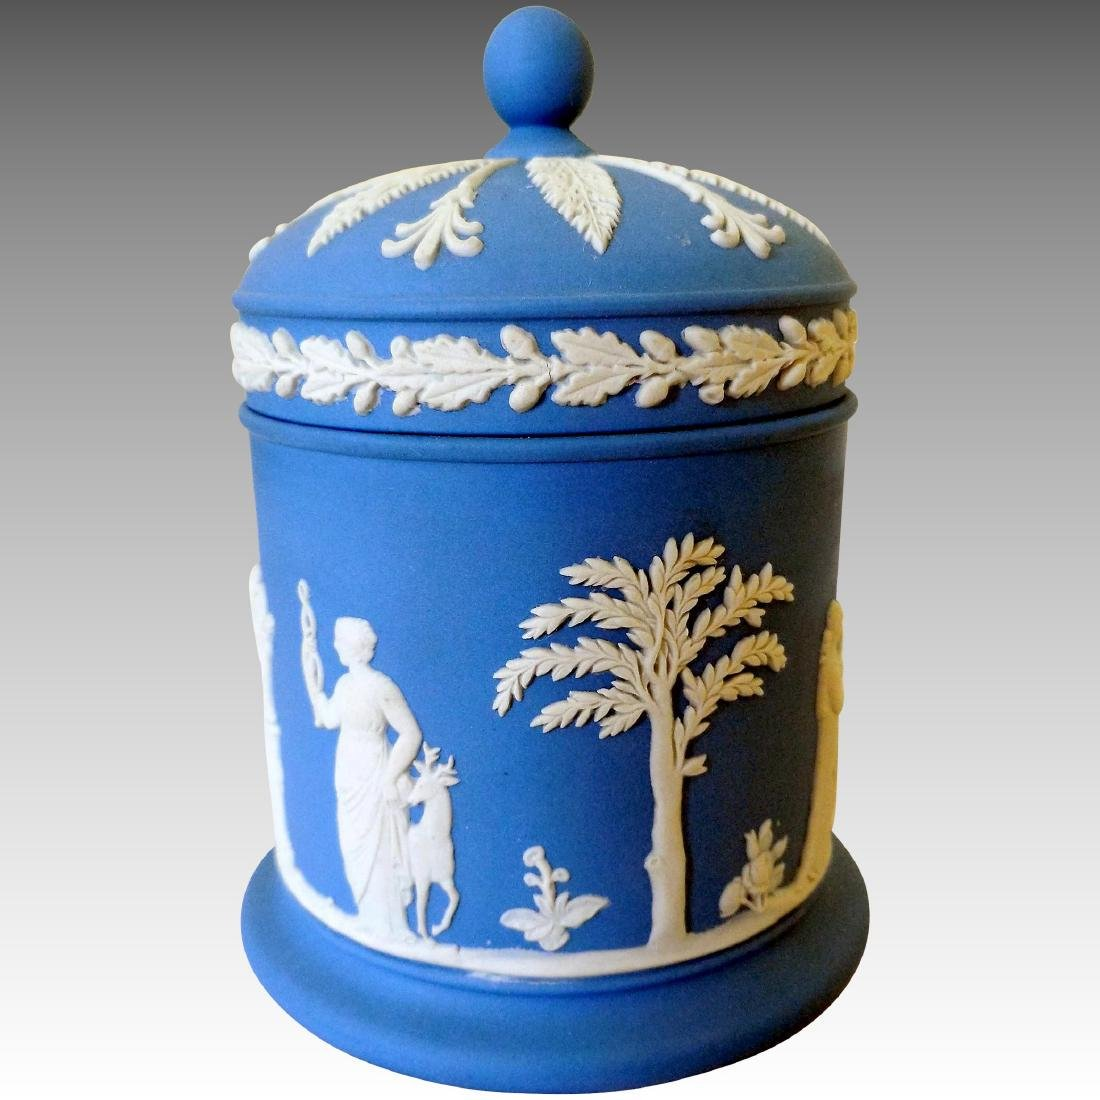 Wedgwood Jasperware Pottery Cache Pot, 1968